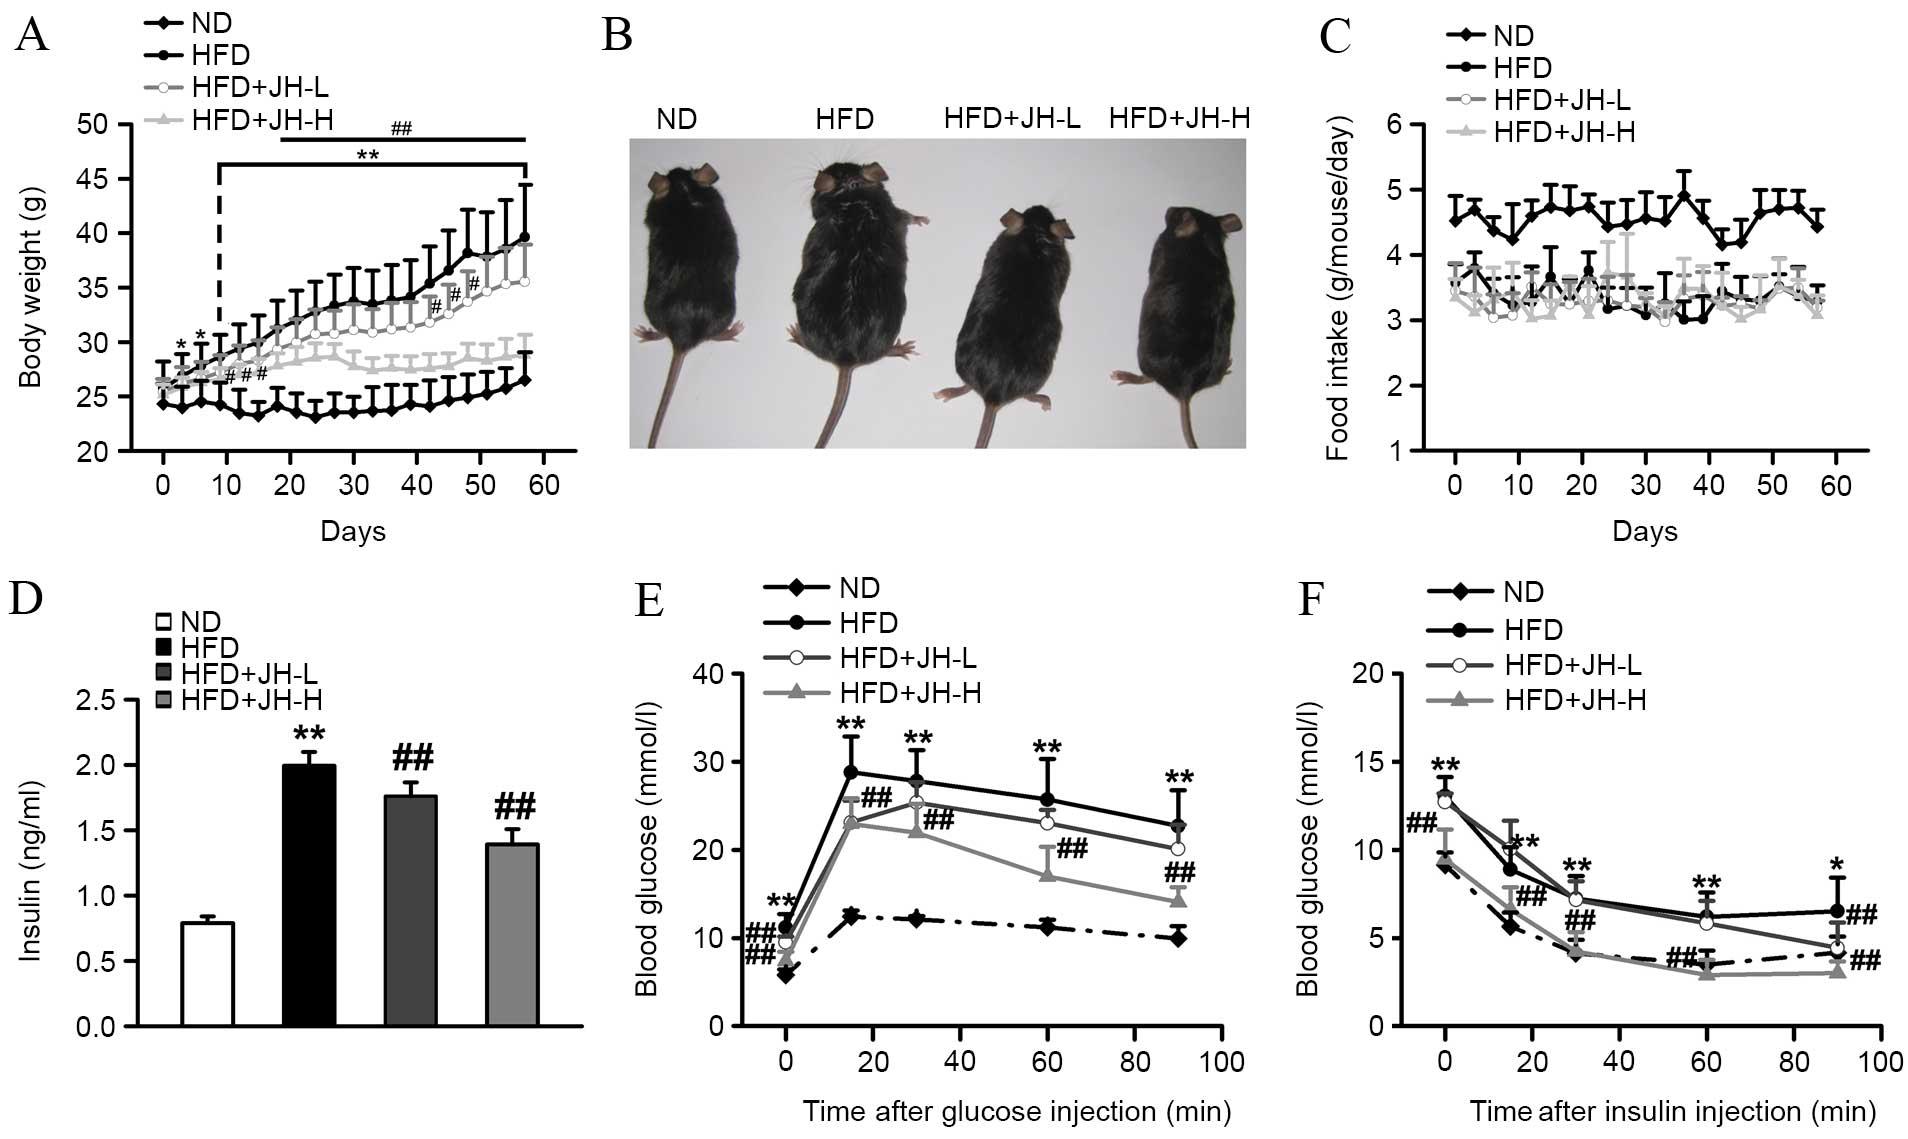 Garcinia cambogia reduces high-fat diet-induced hyperlipidemia